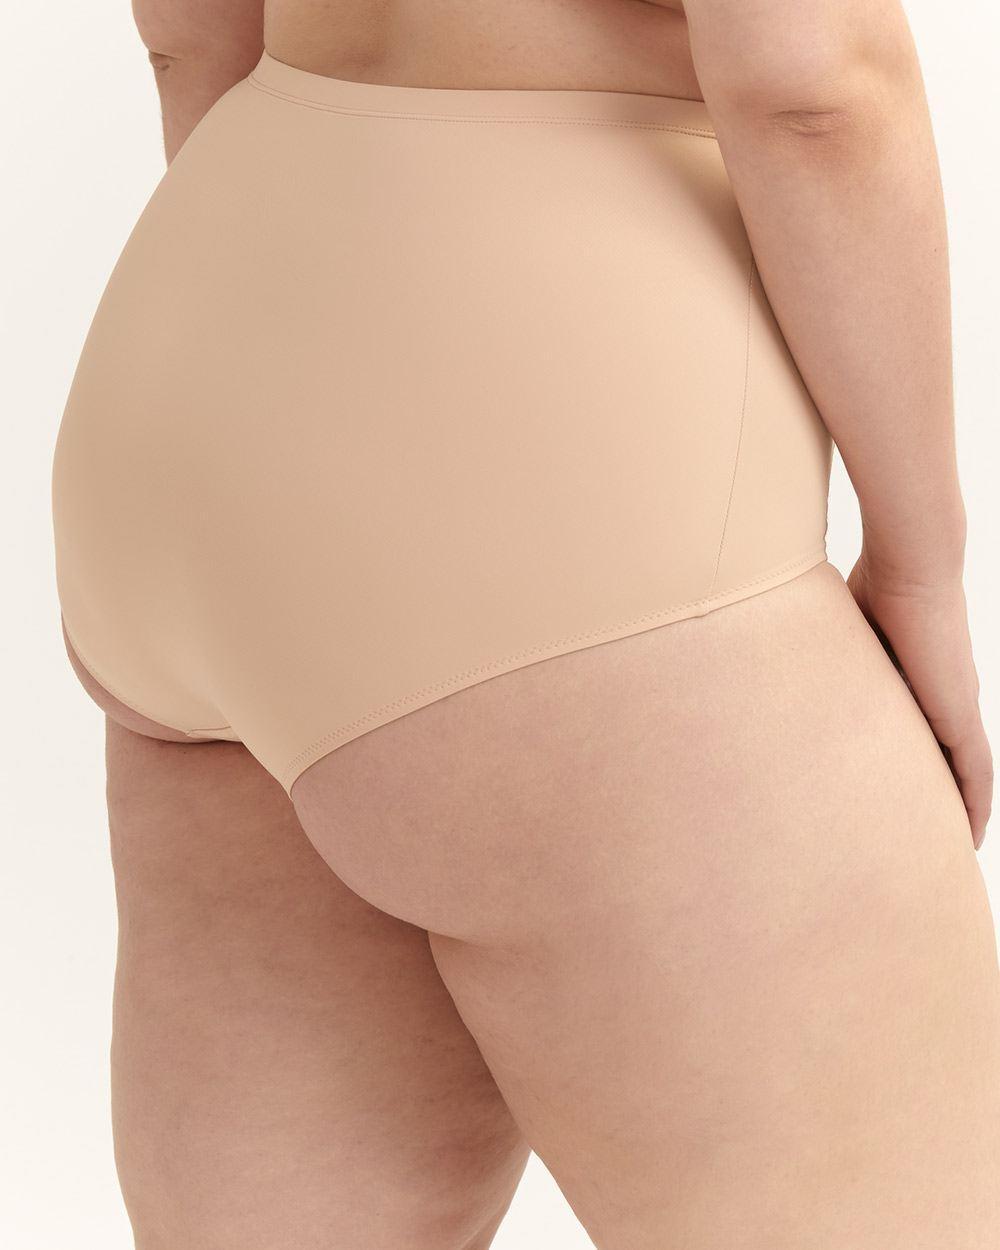 443cbfedb4f Lyst - Addition Elle High Cut Brief Panty - Ti Voglio in Natural